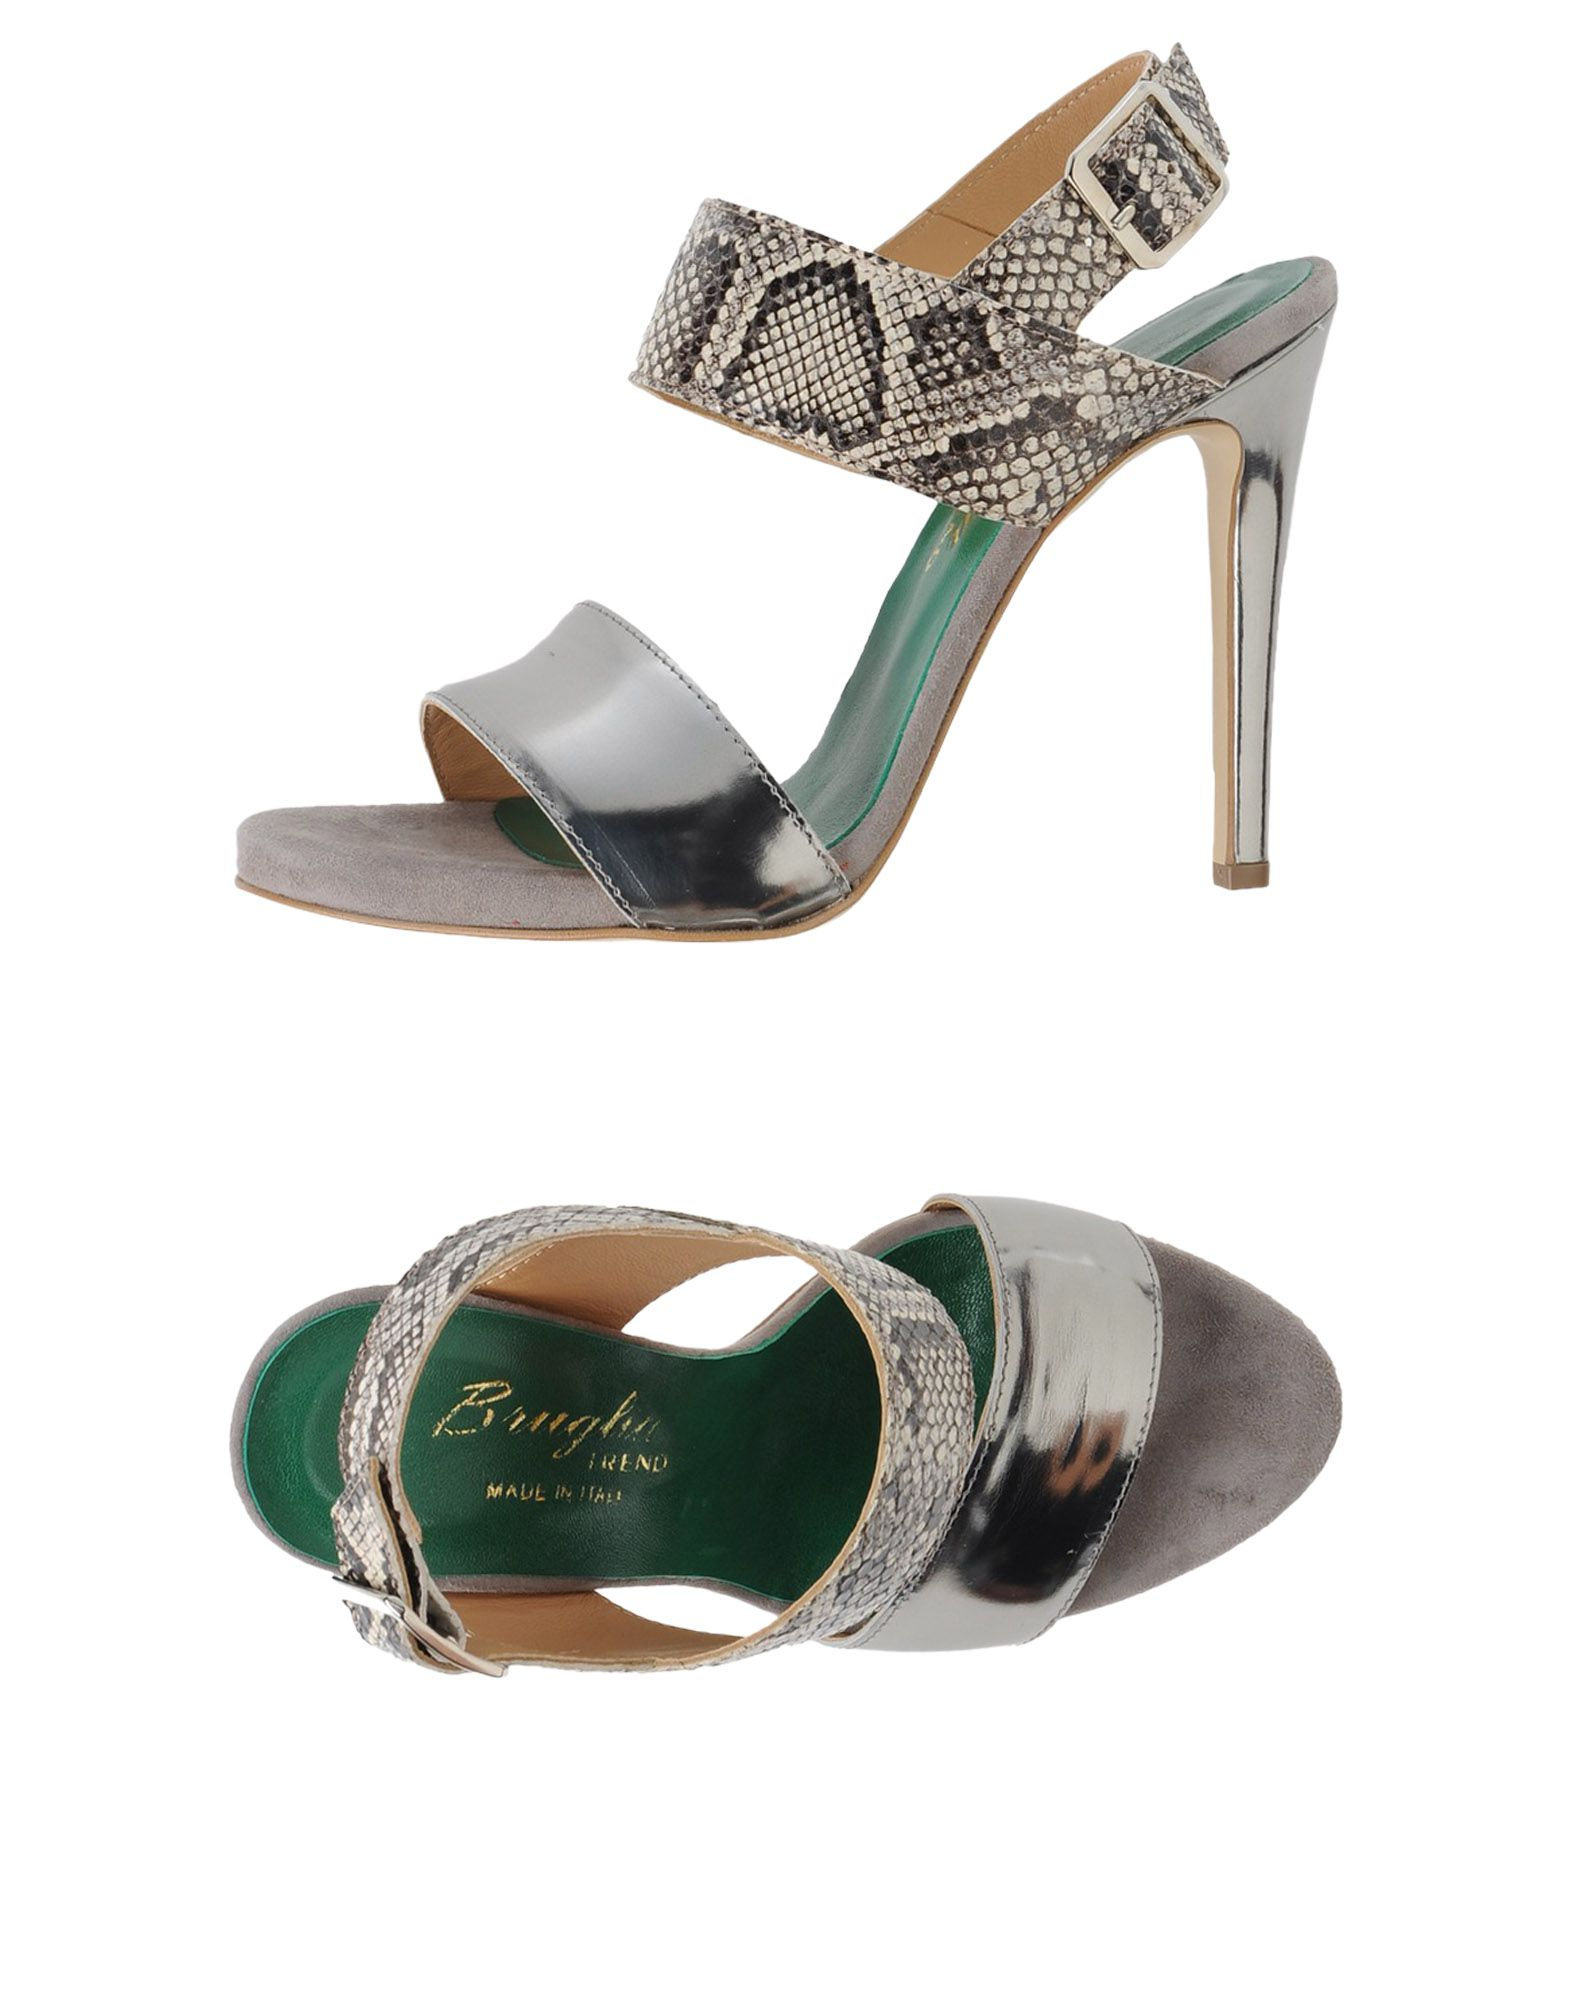 F.Lli Bruglia Sandalen Damen  11345283TW Gute Qualität beliebte Schuhe